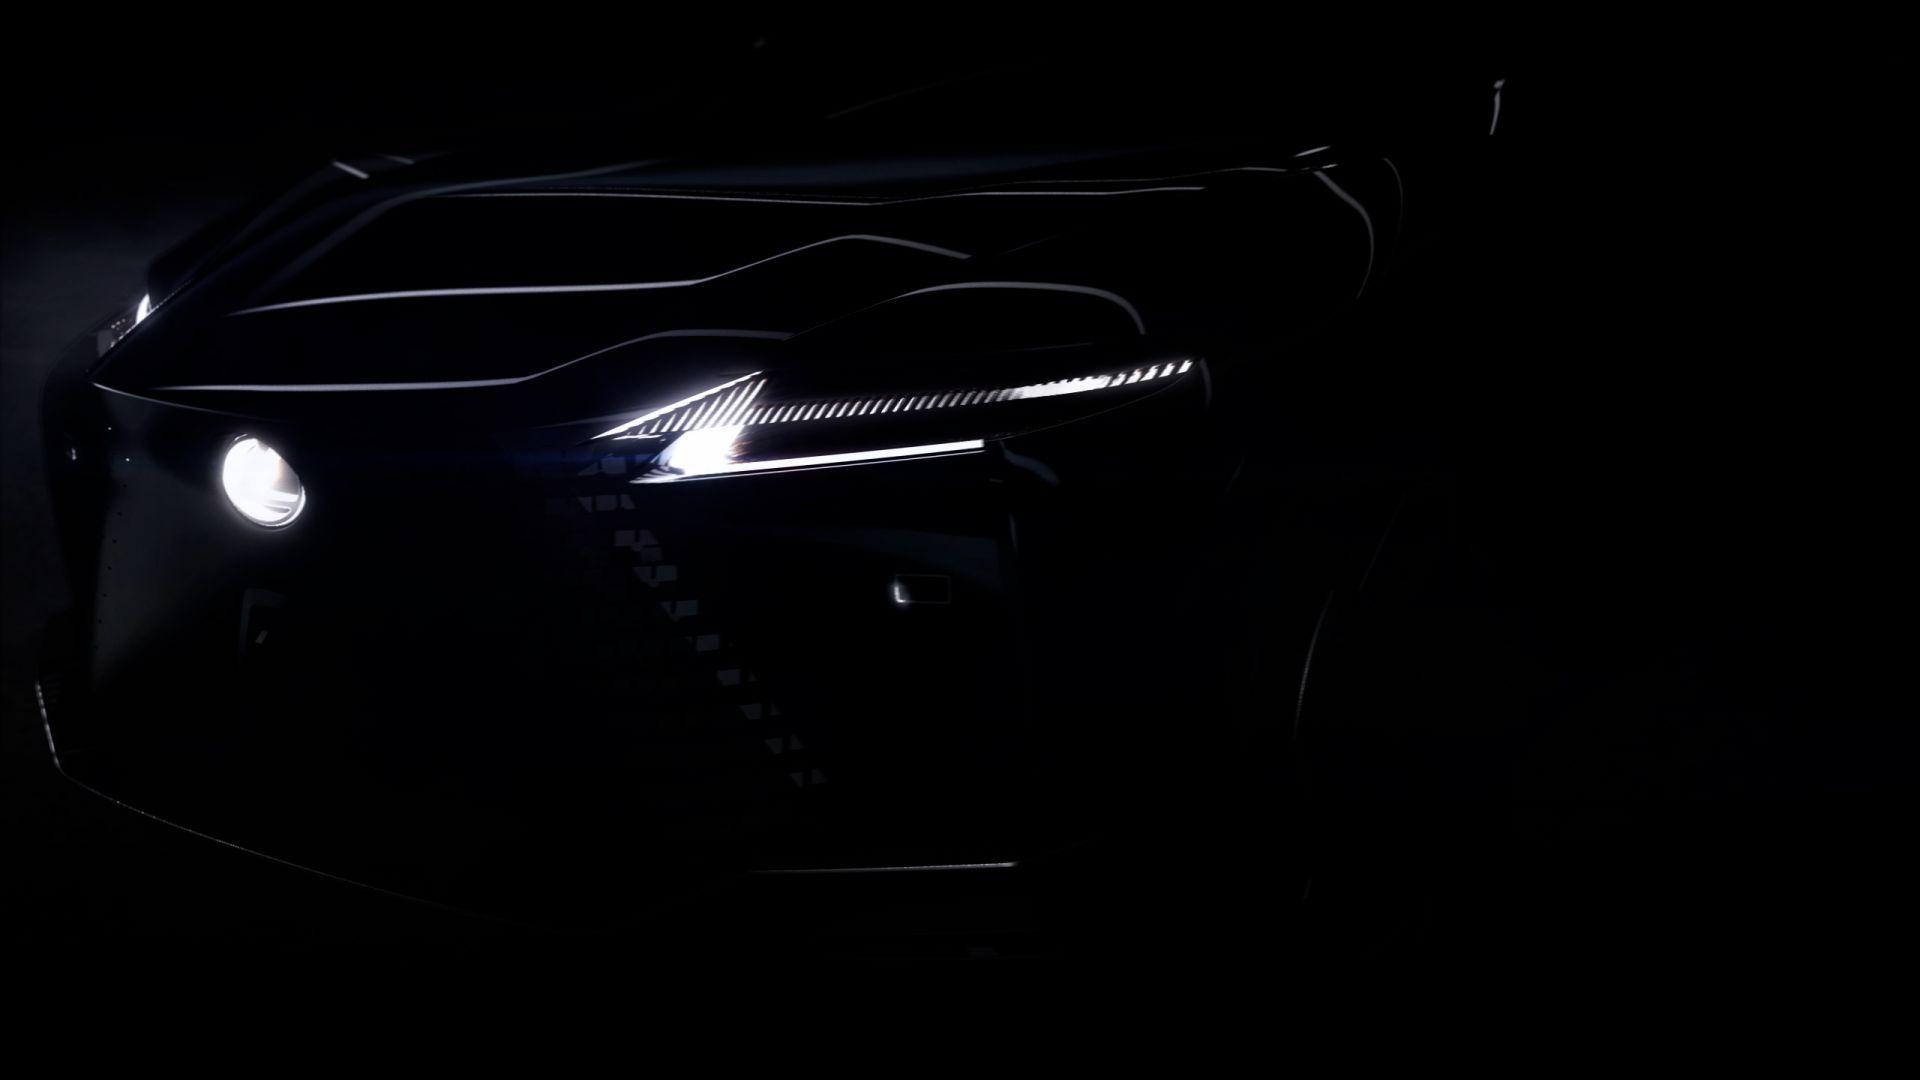 Lexus: Ausblick auf E-Konzeptfahrzeug & elektr. Antriebssteuerung Direct4